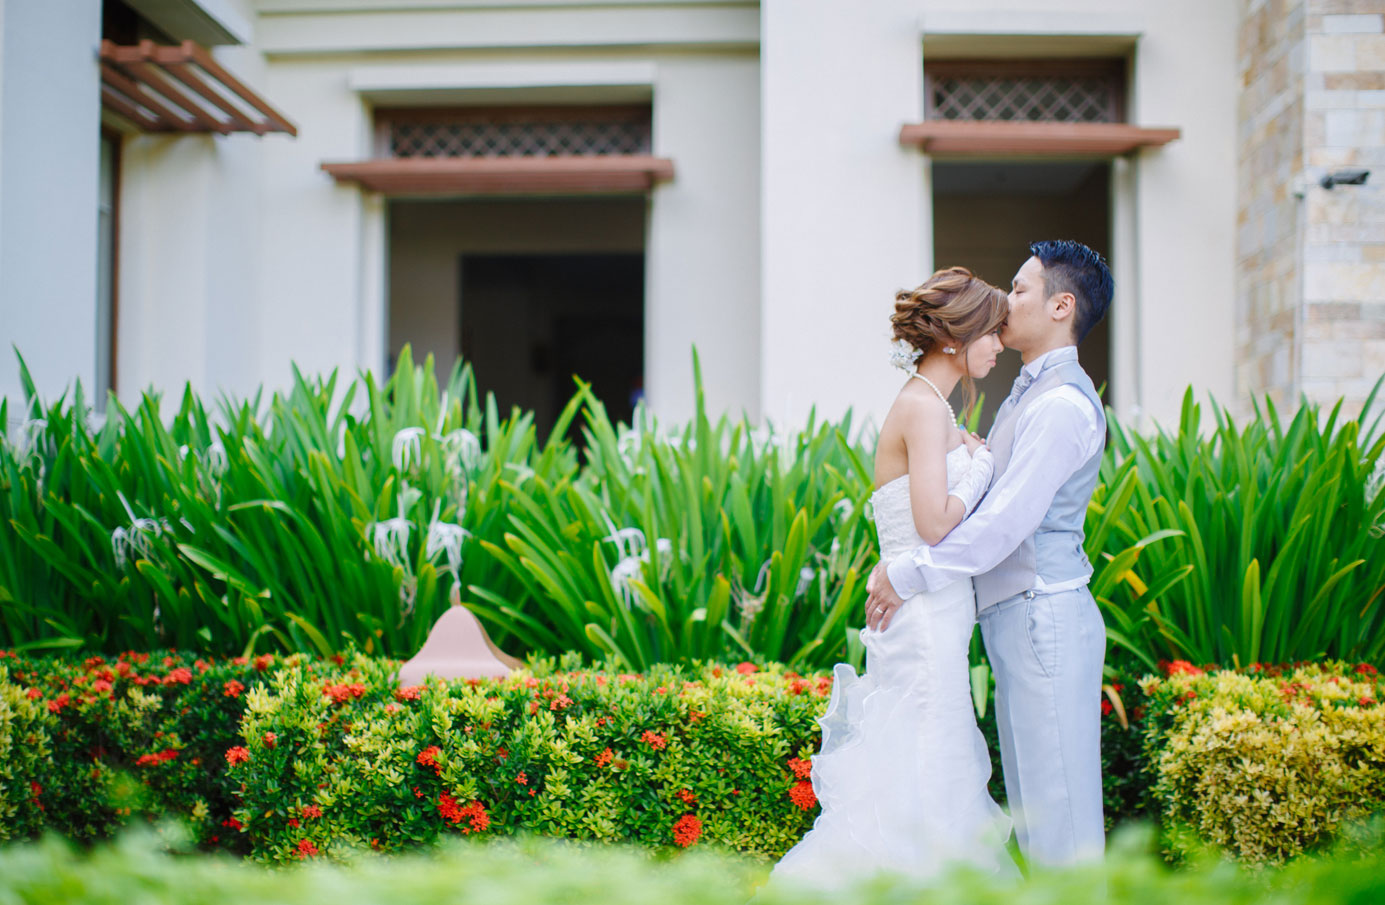 cebu-photo-wedding-crimson2